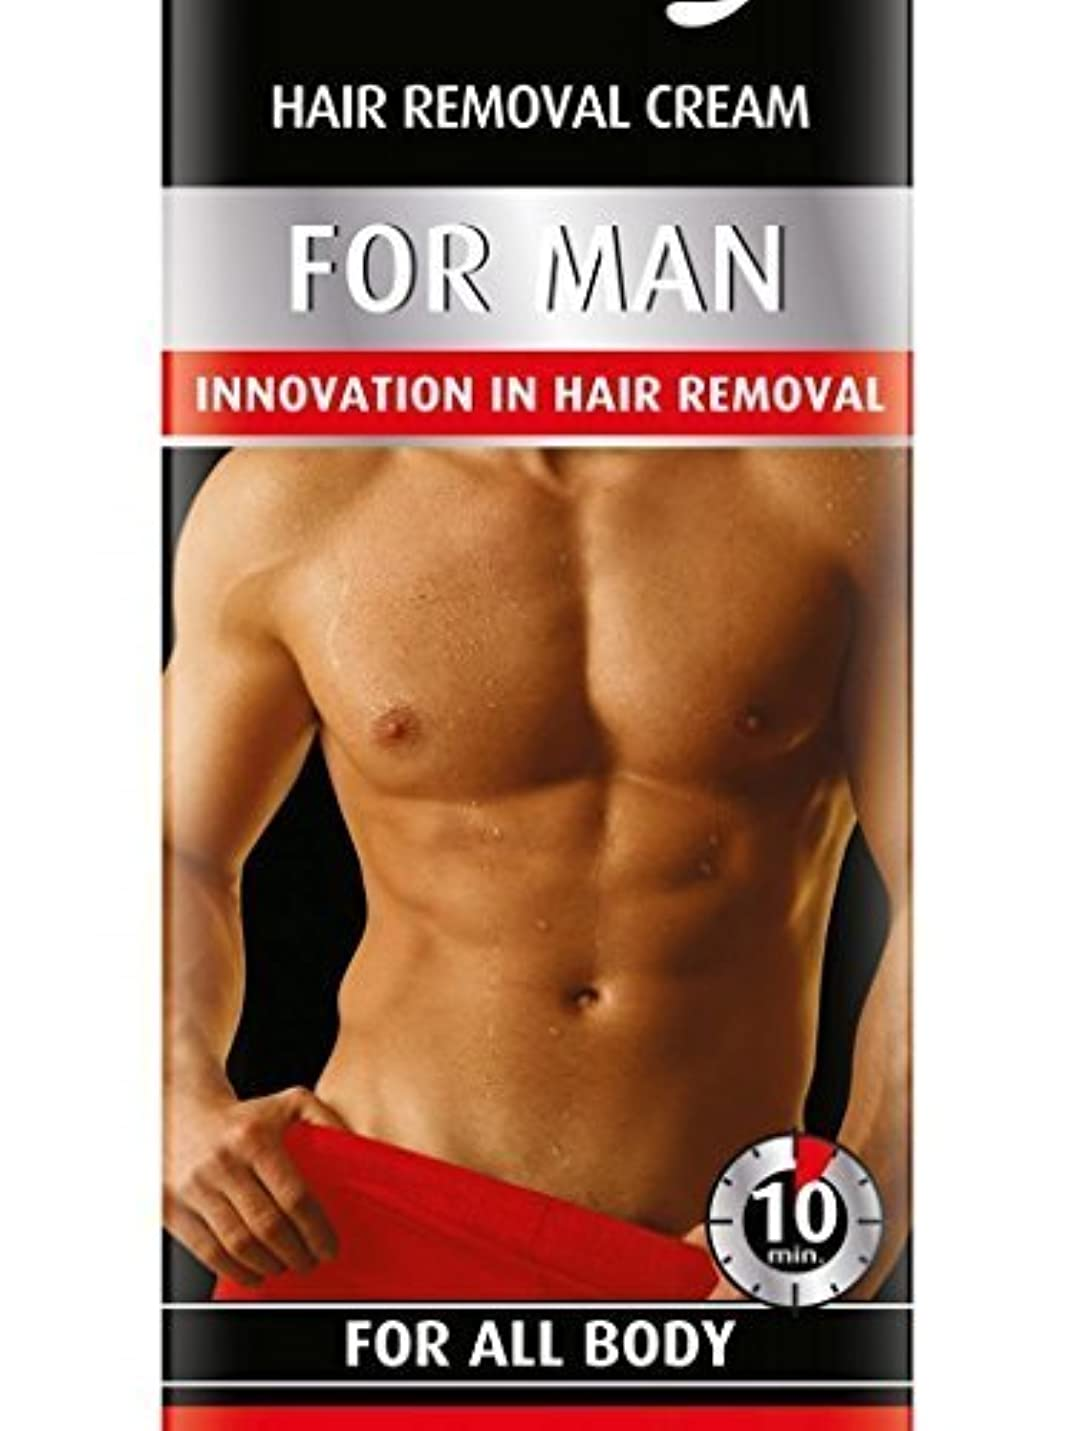 Hair Removal Cream For Men For All Body 100ml by Bielenda [並行輸入品]